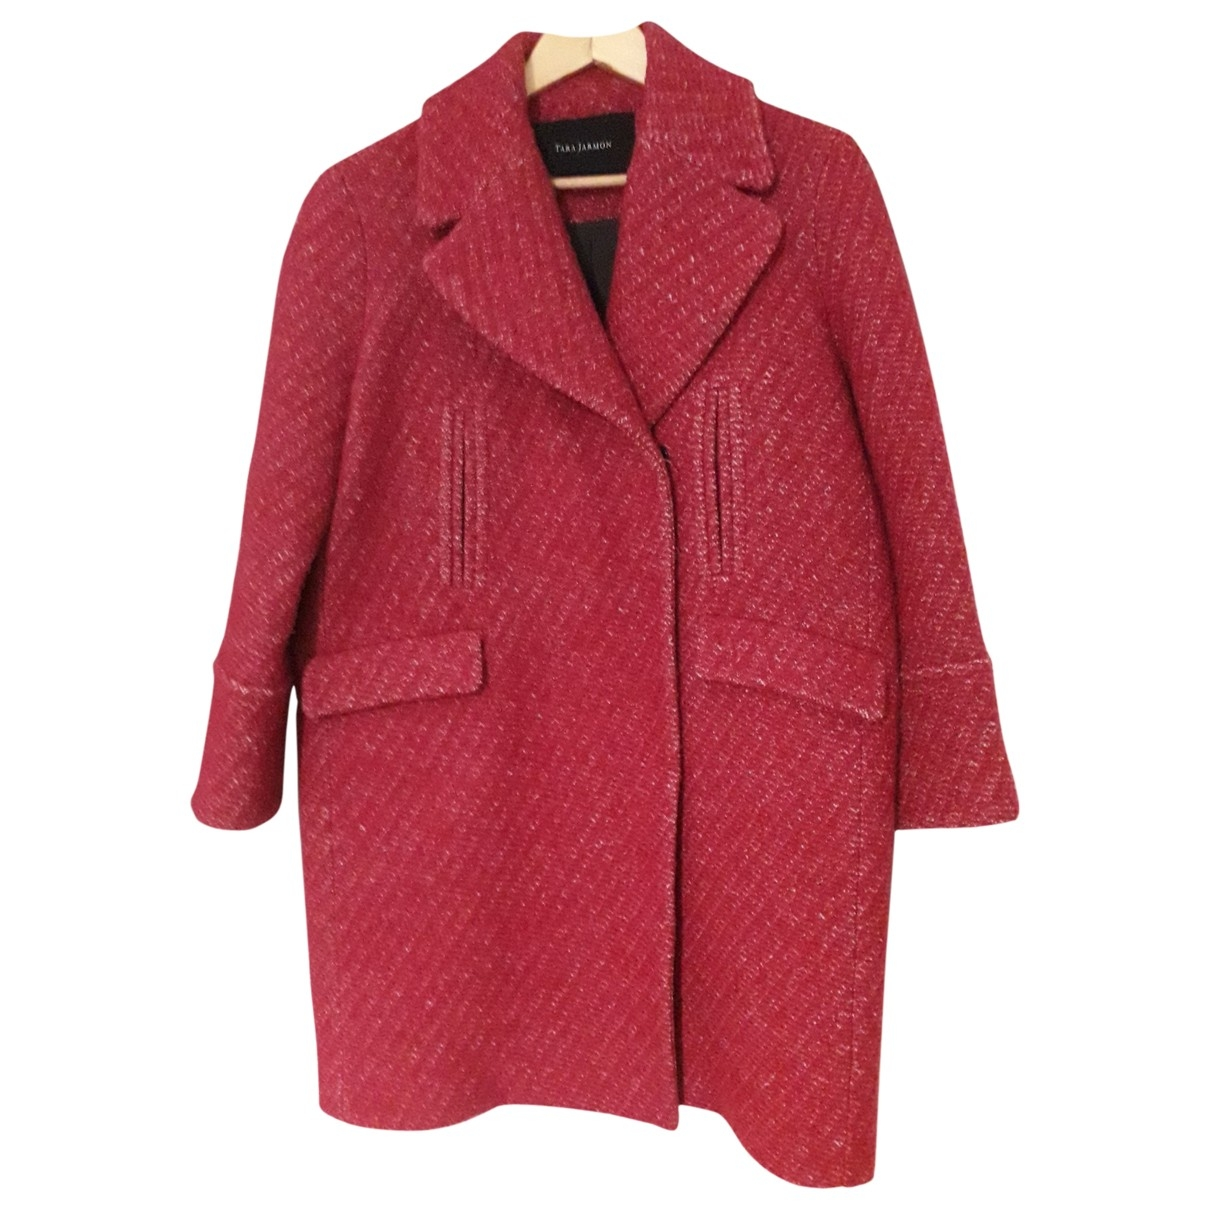 Tara Jarmon \N Pink Wool coat for Women 38 FR